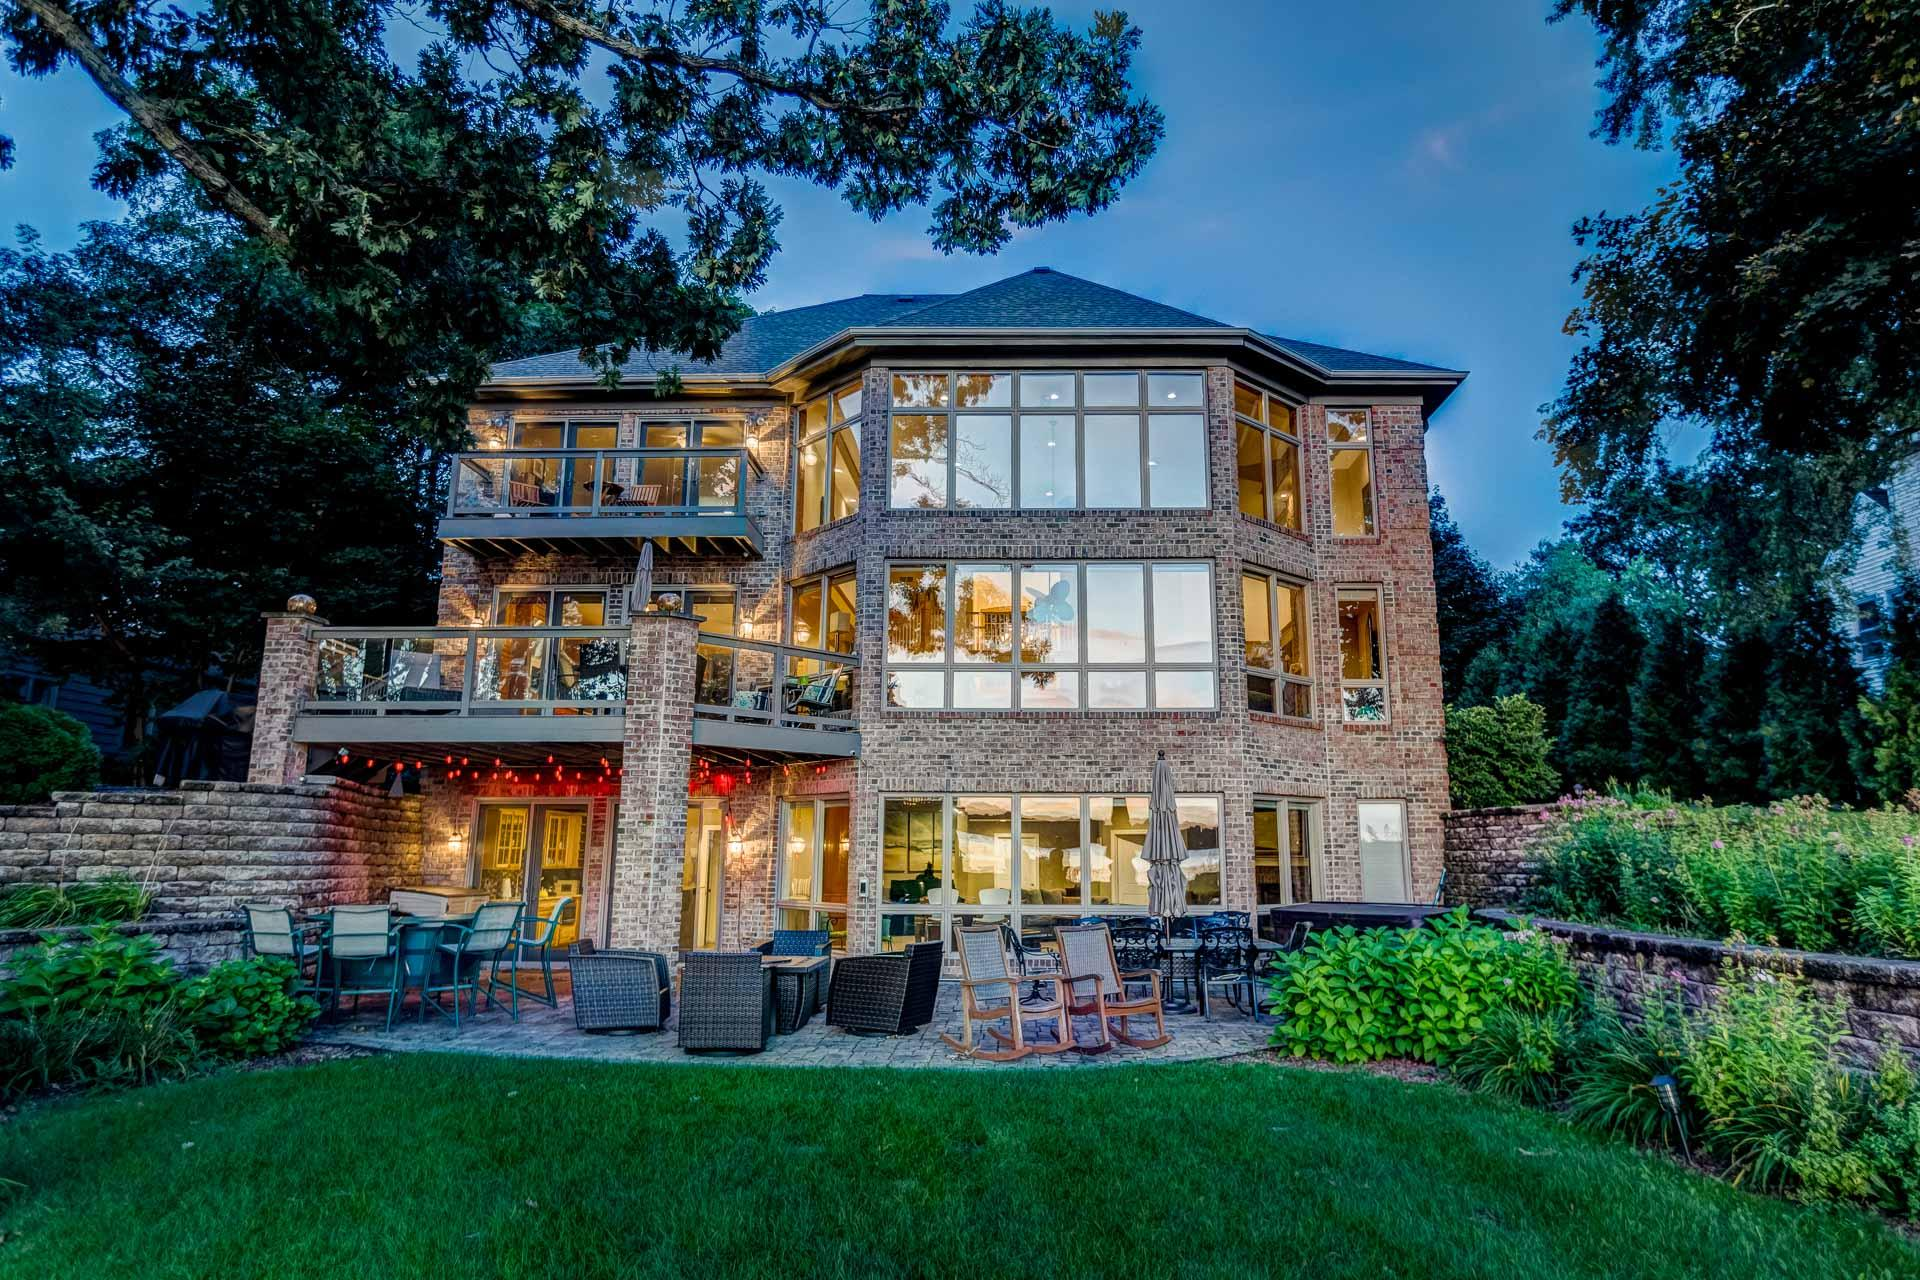 2617 Nagawicka Rd, Delafield, Wisconsin 53029, 5 Bedrooms Bedrooms, 11 Rooms Rooms,5 BathroomsBathrooms,Single-Family,For Sale,Nagawicka Rd,1629187